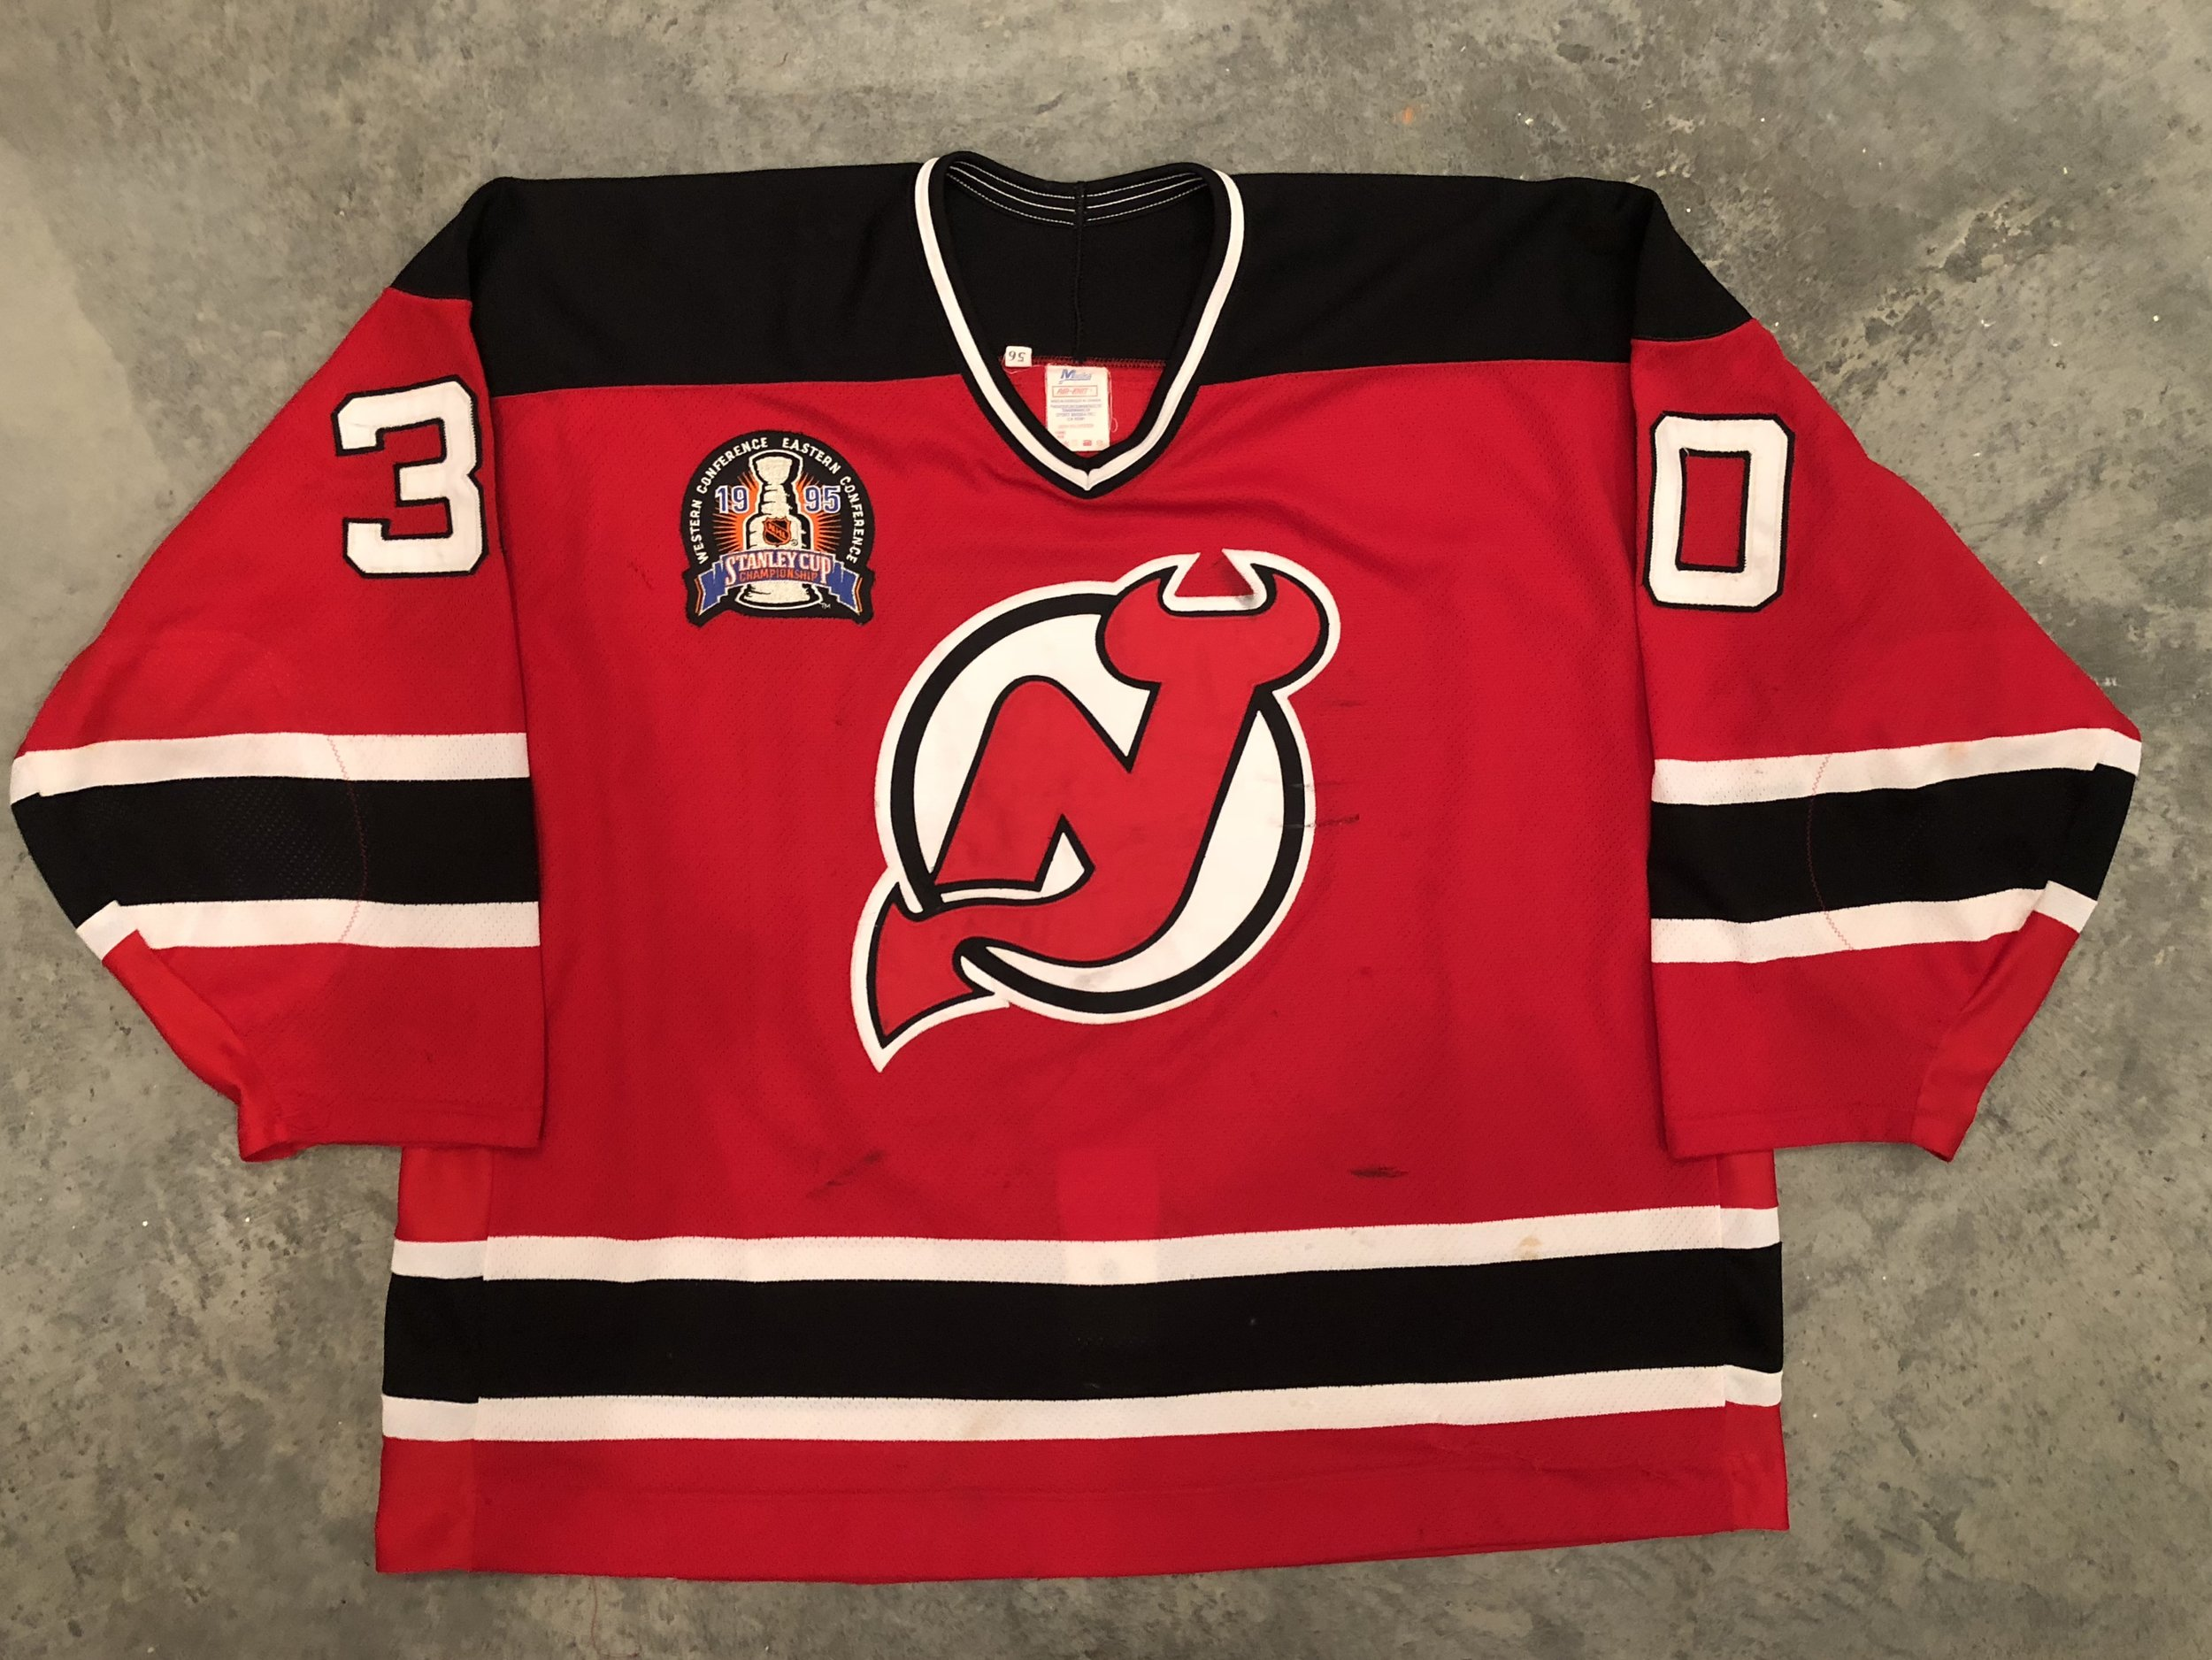 1995 New Jersey Devils Game Worn Stanley Cup Finals Road Jersey - Martin Brodeur